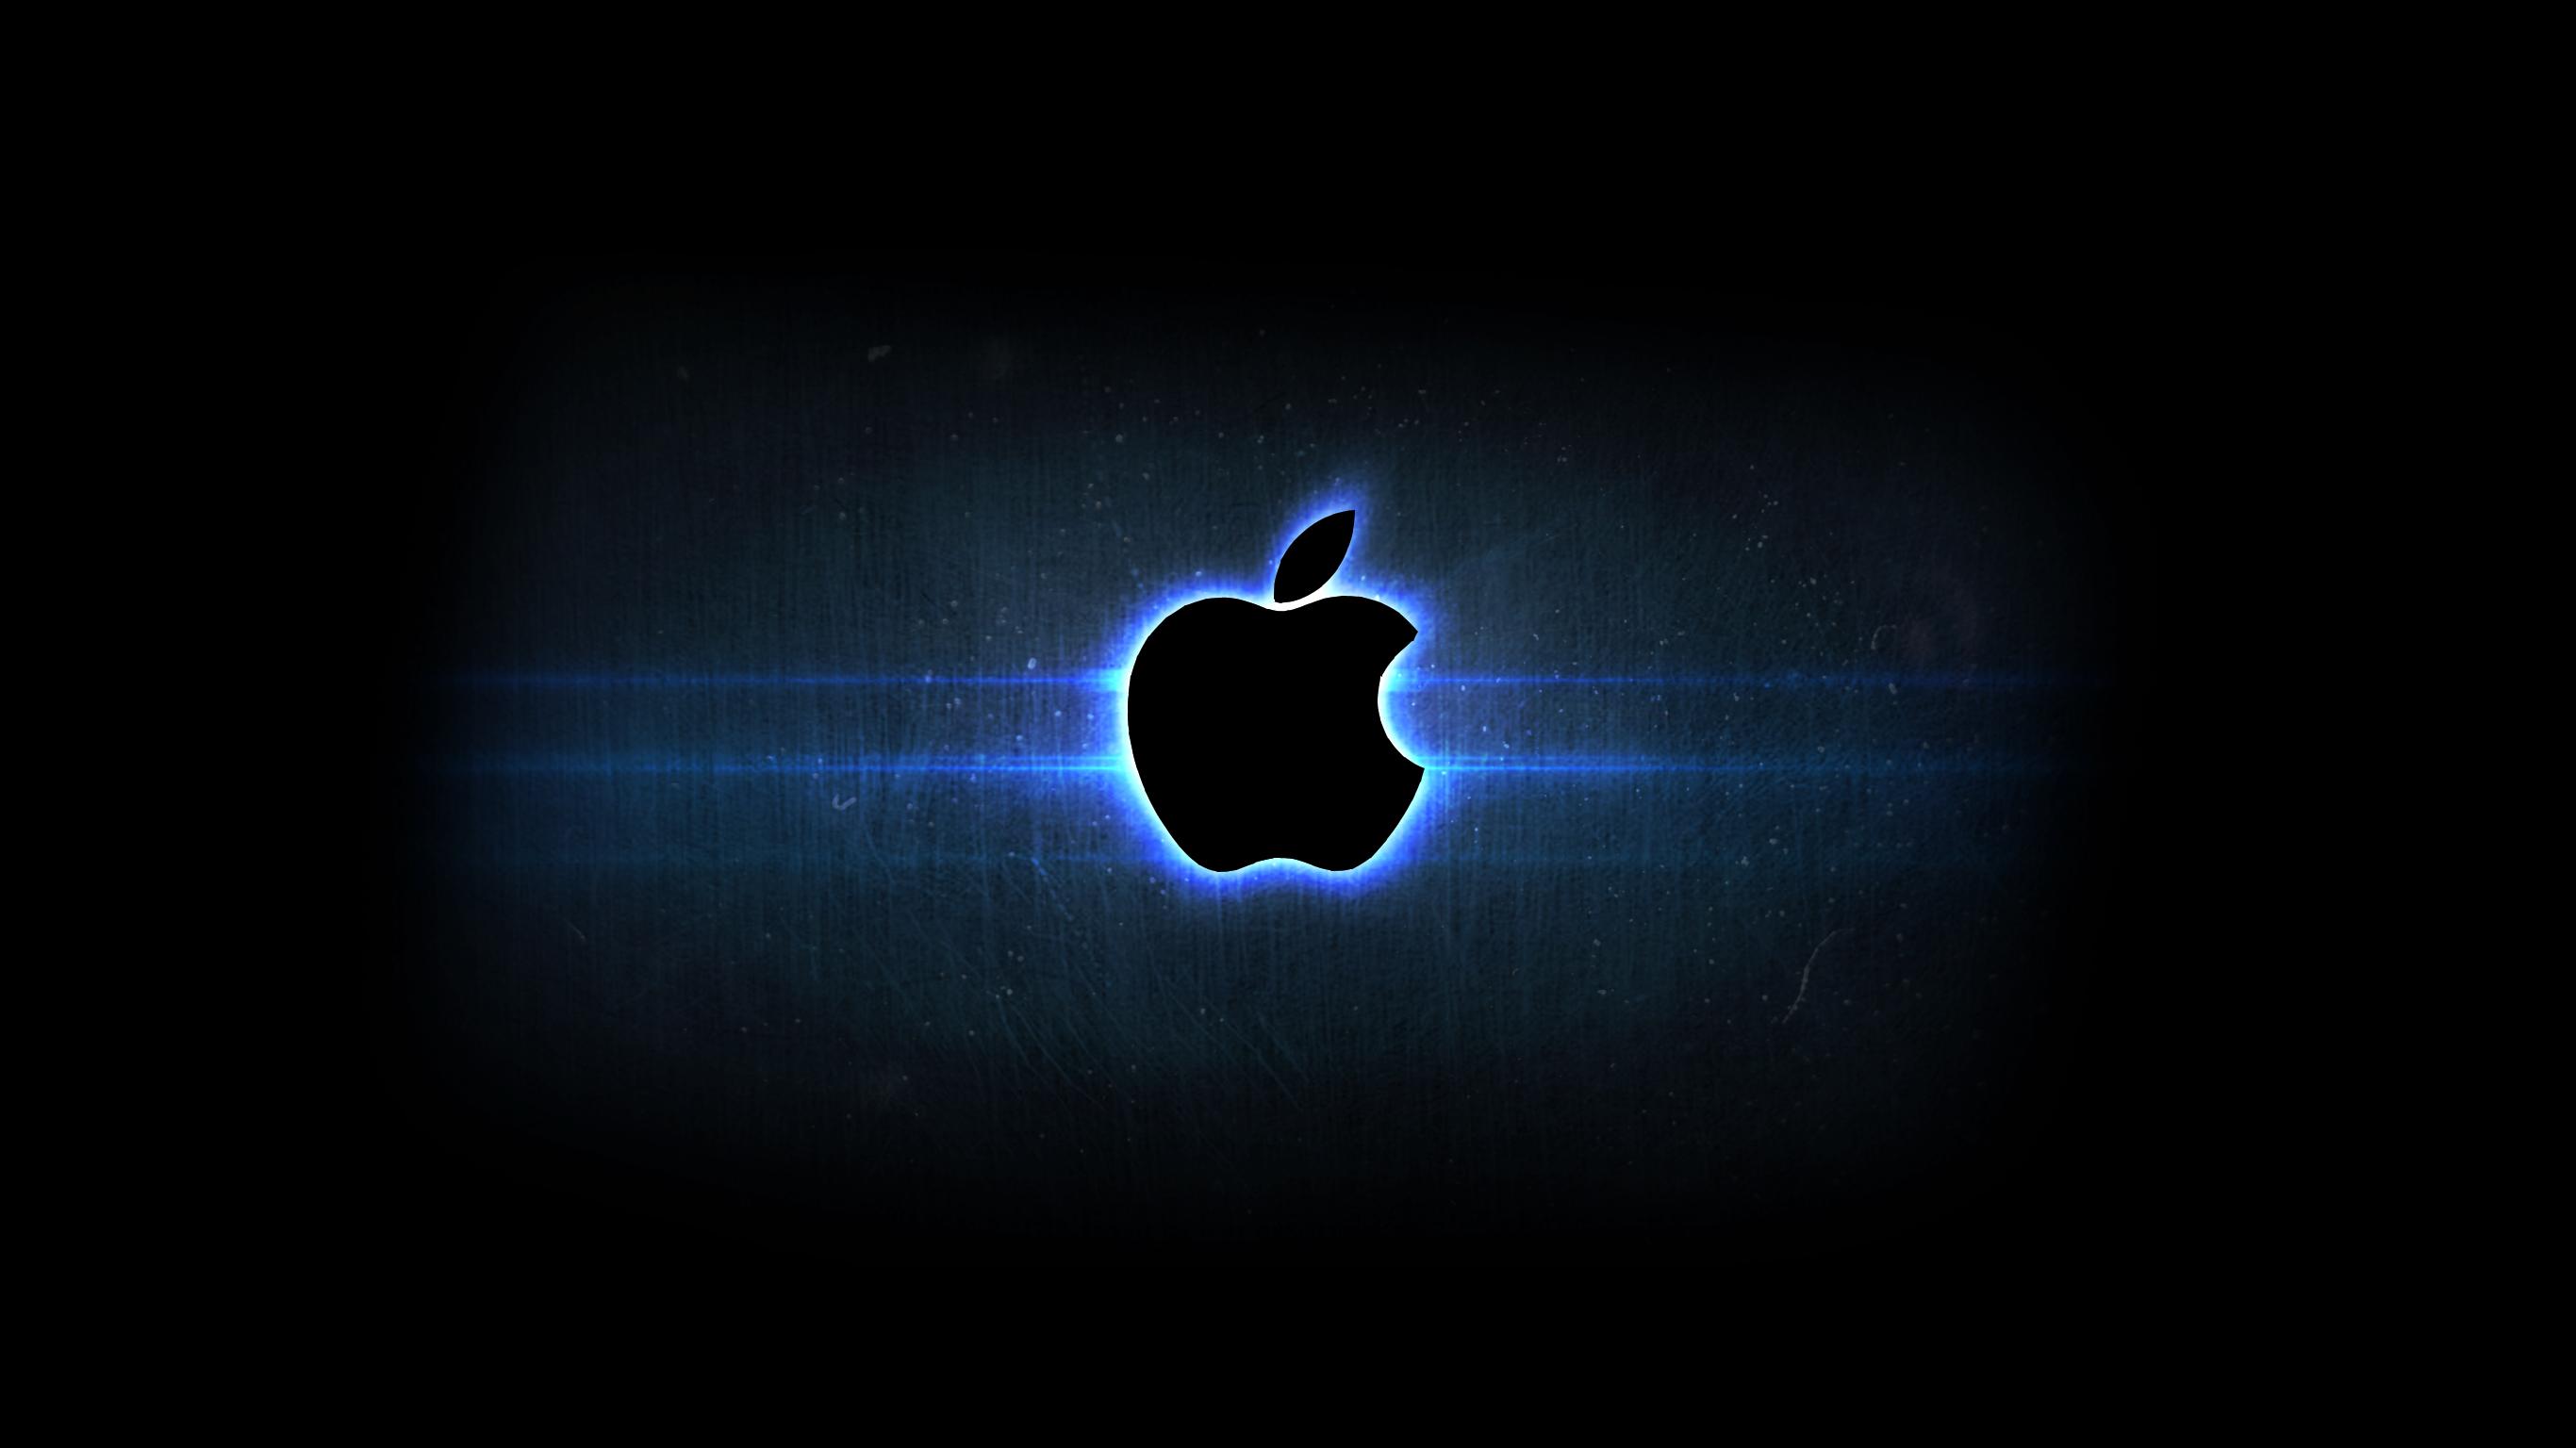 Apple Wallpaper Background 33